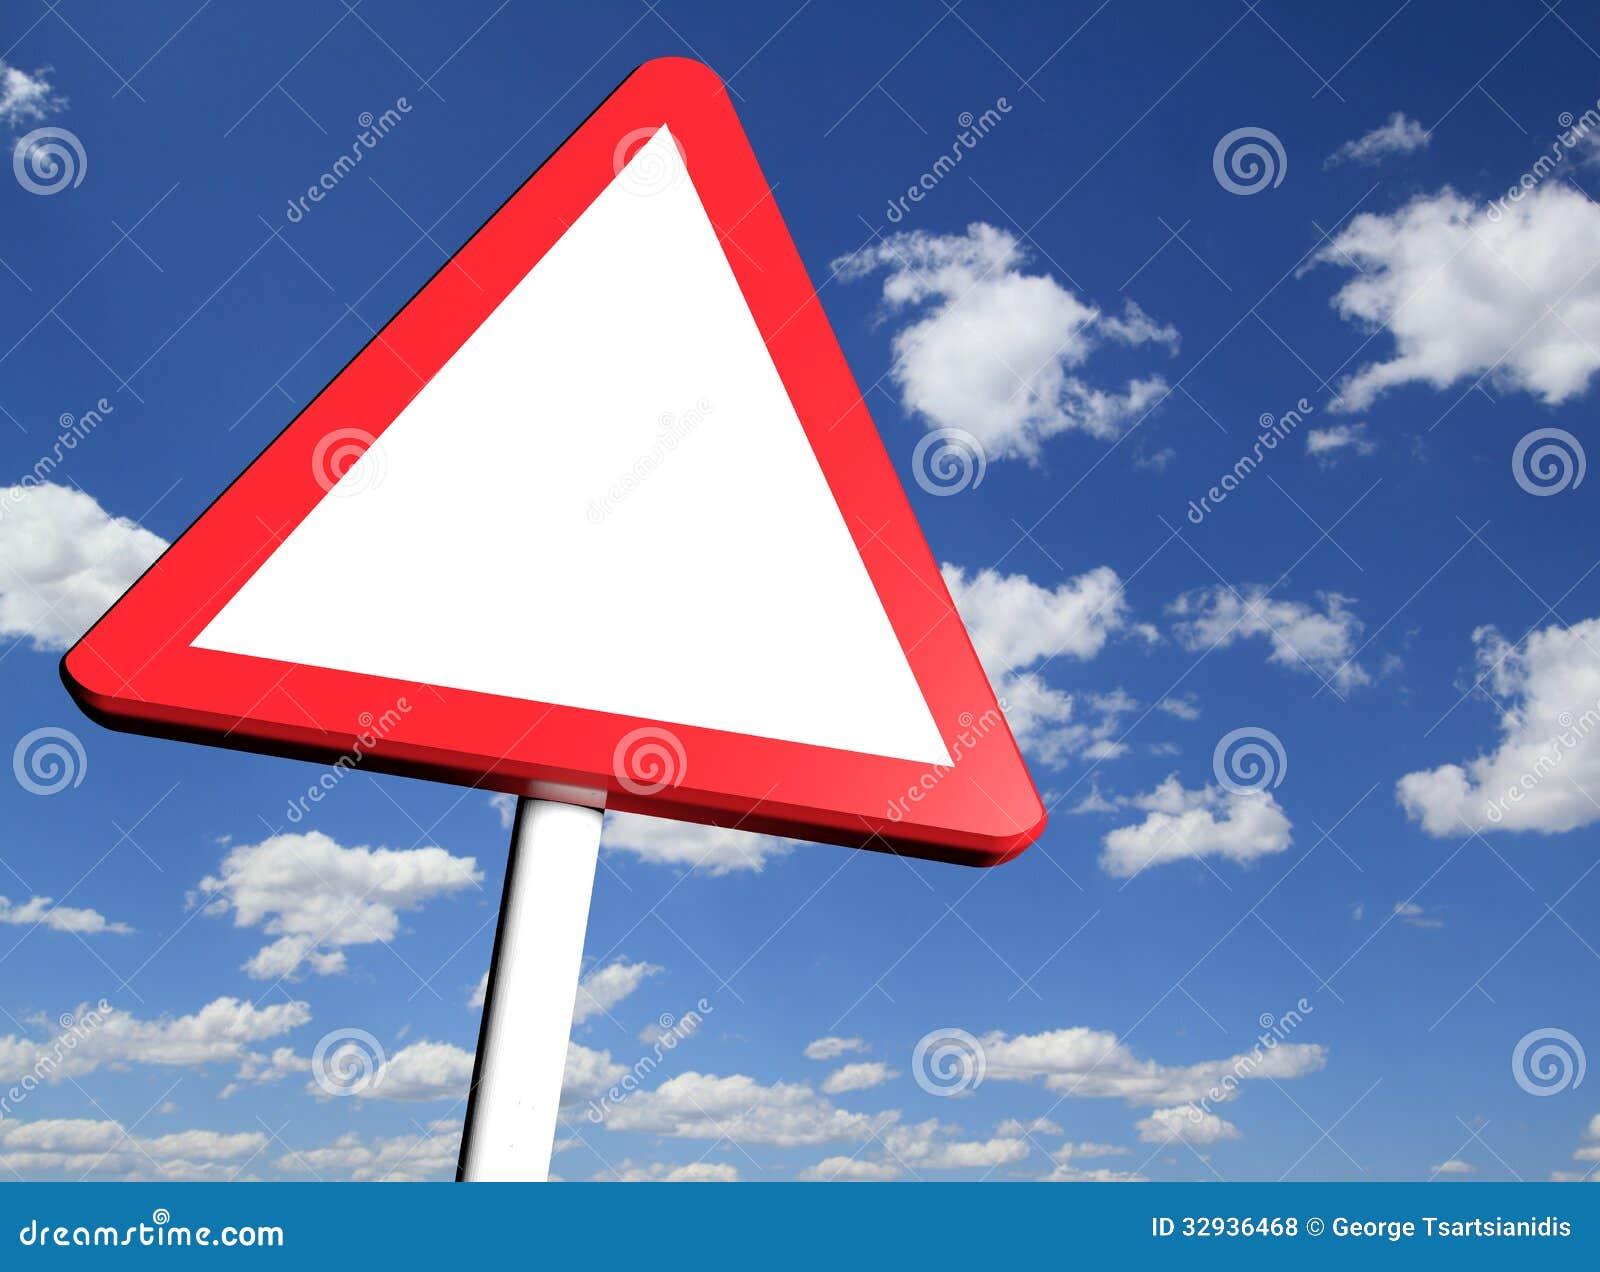 Blank danger ahead warning road sign